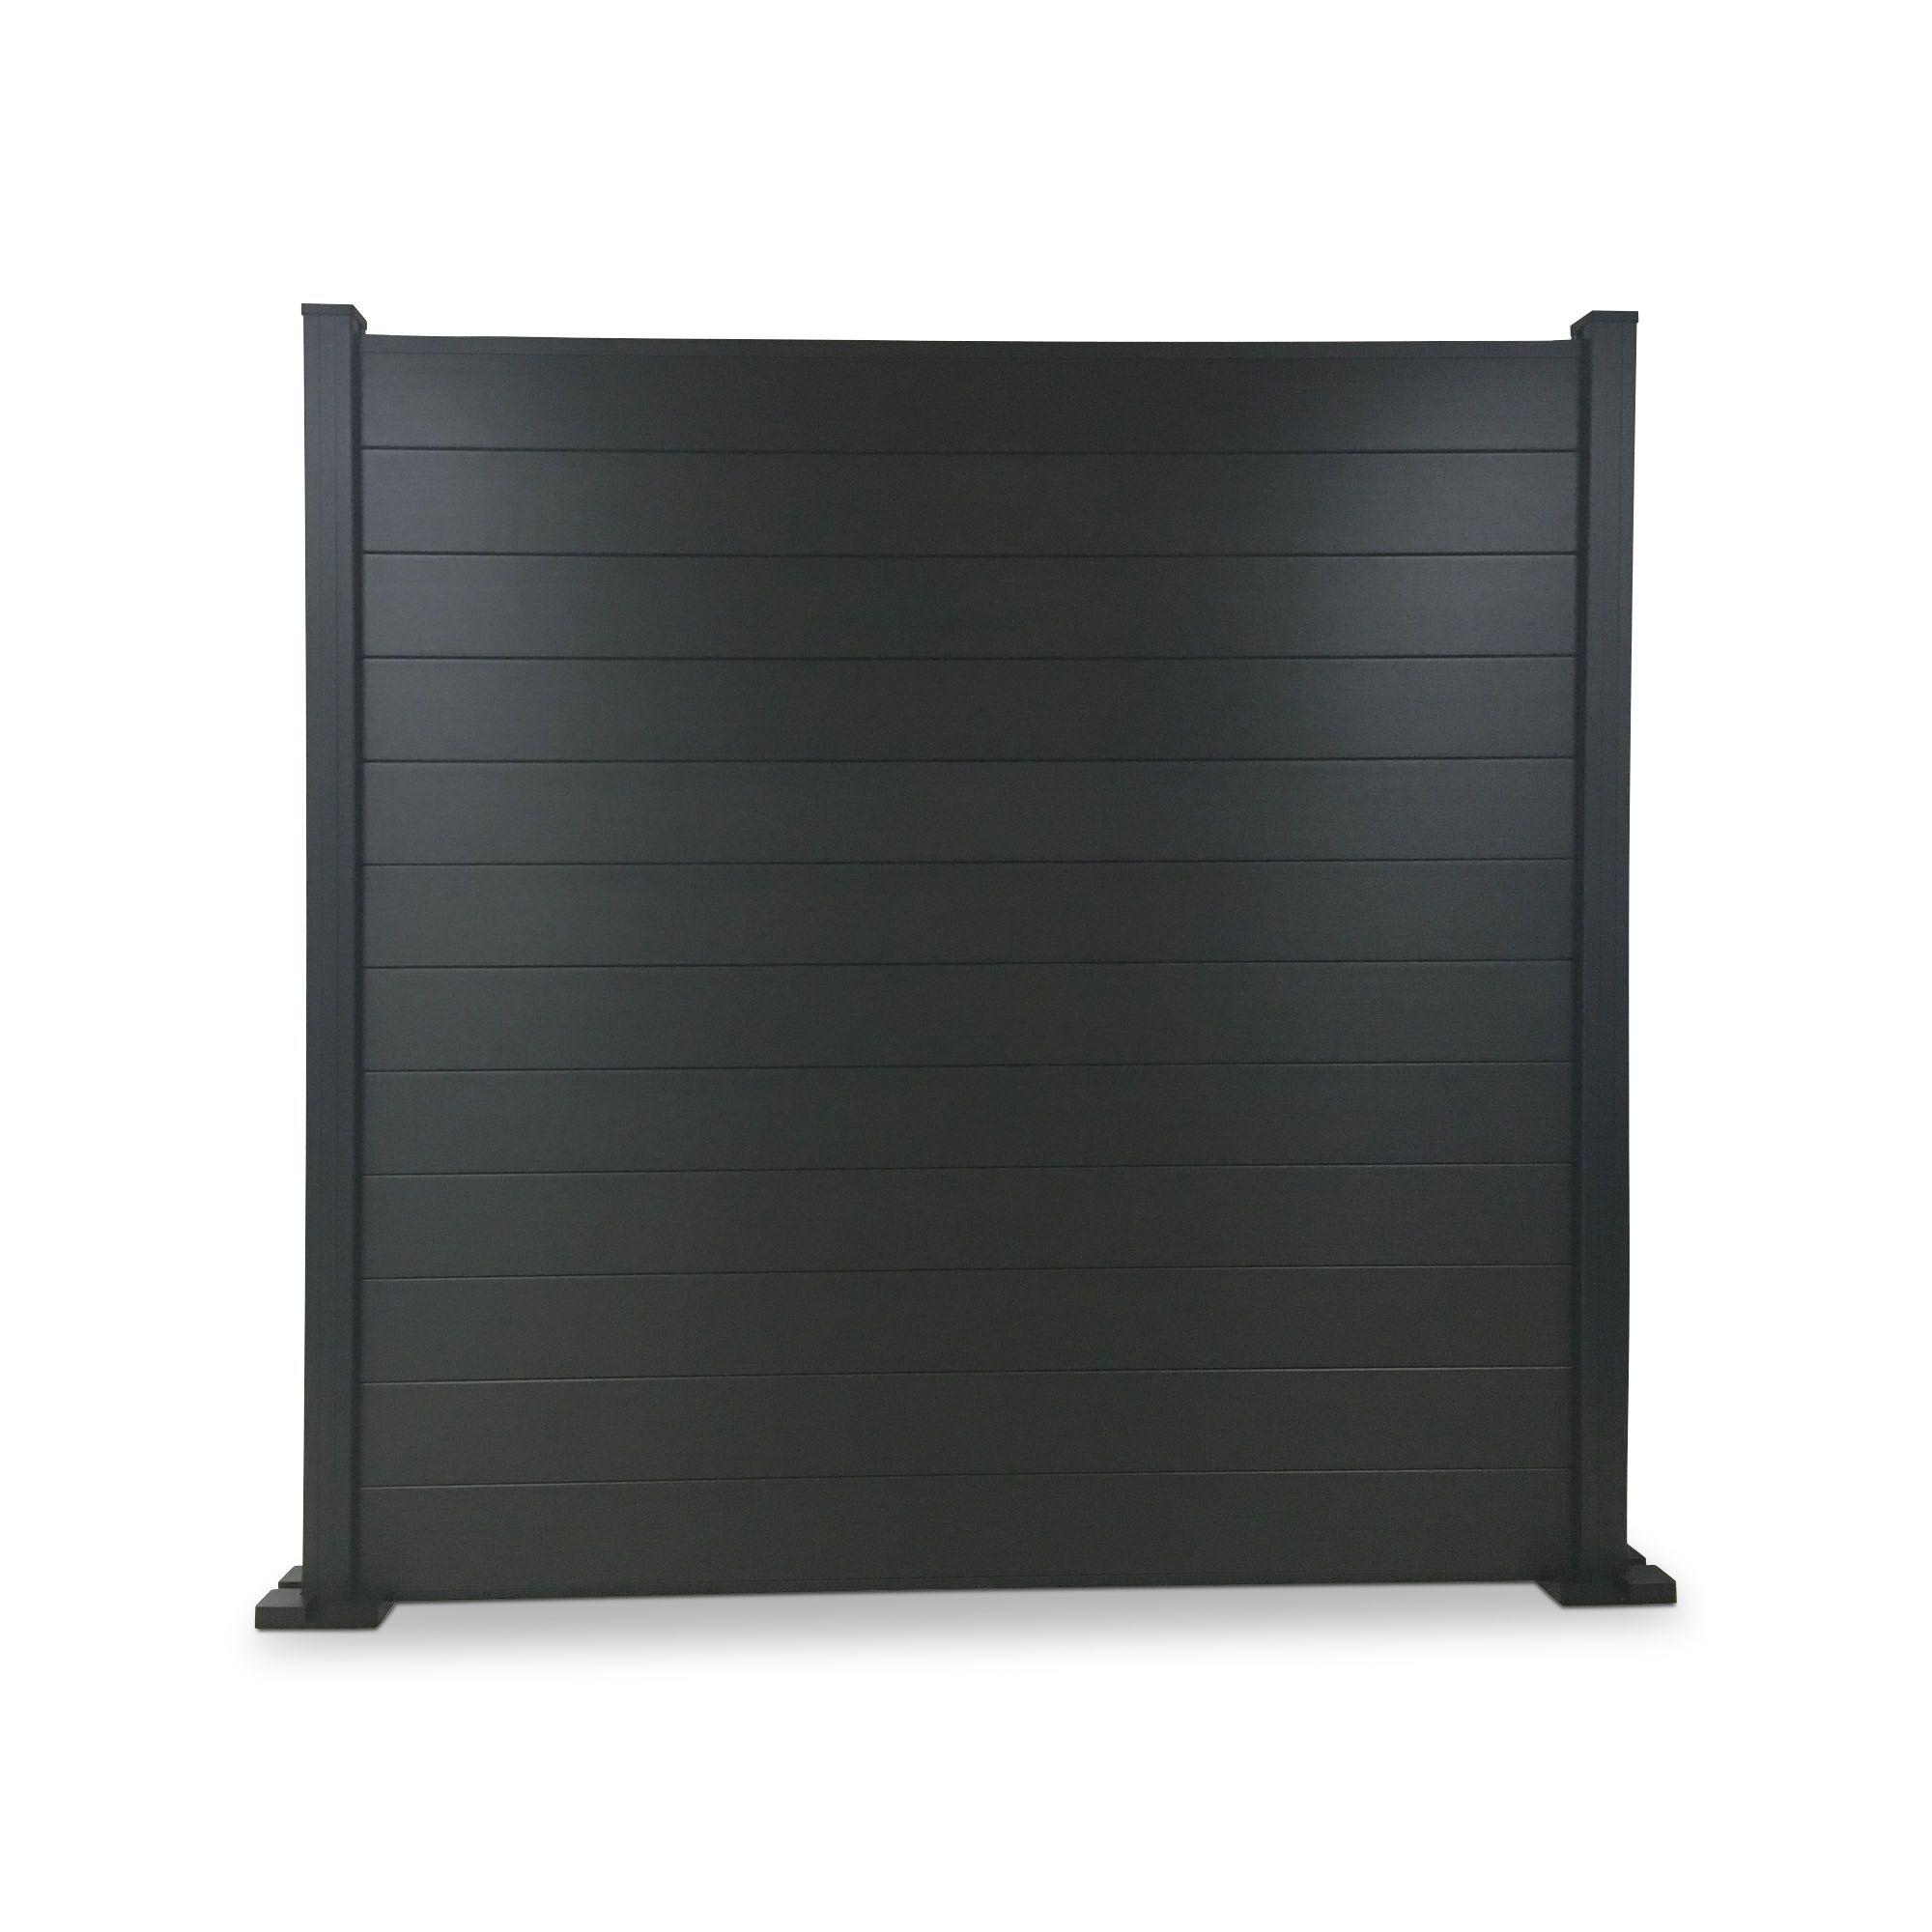 blooma neva composite fence slat w 1790mm h 155mm pack of 3 departments diy at b q. Black Bedroom Furniture Sets. Home Design Ideas